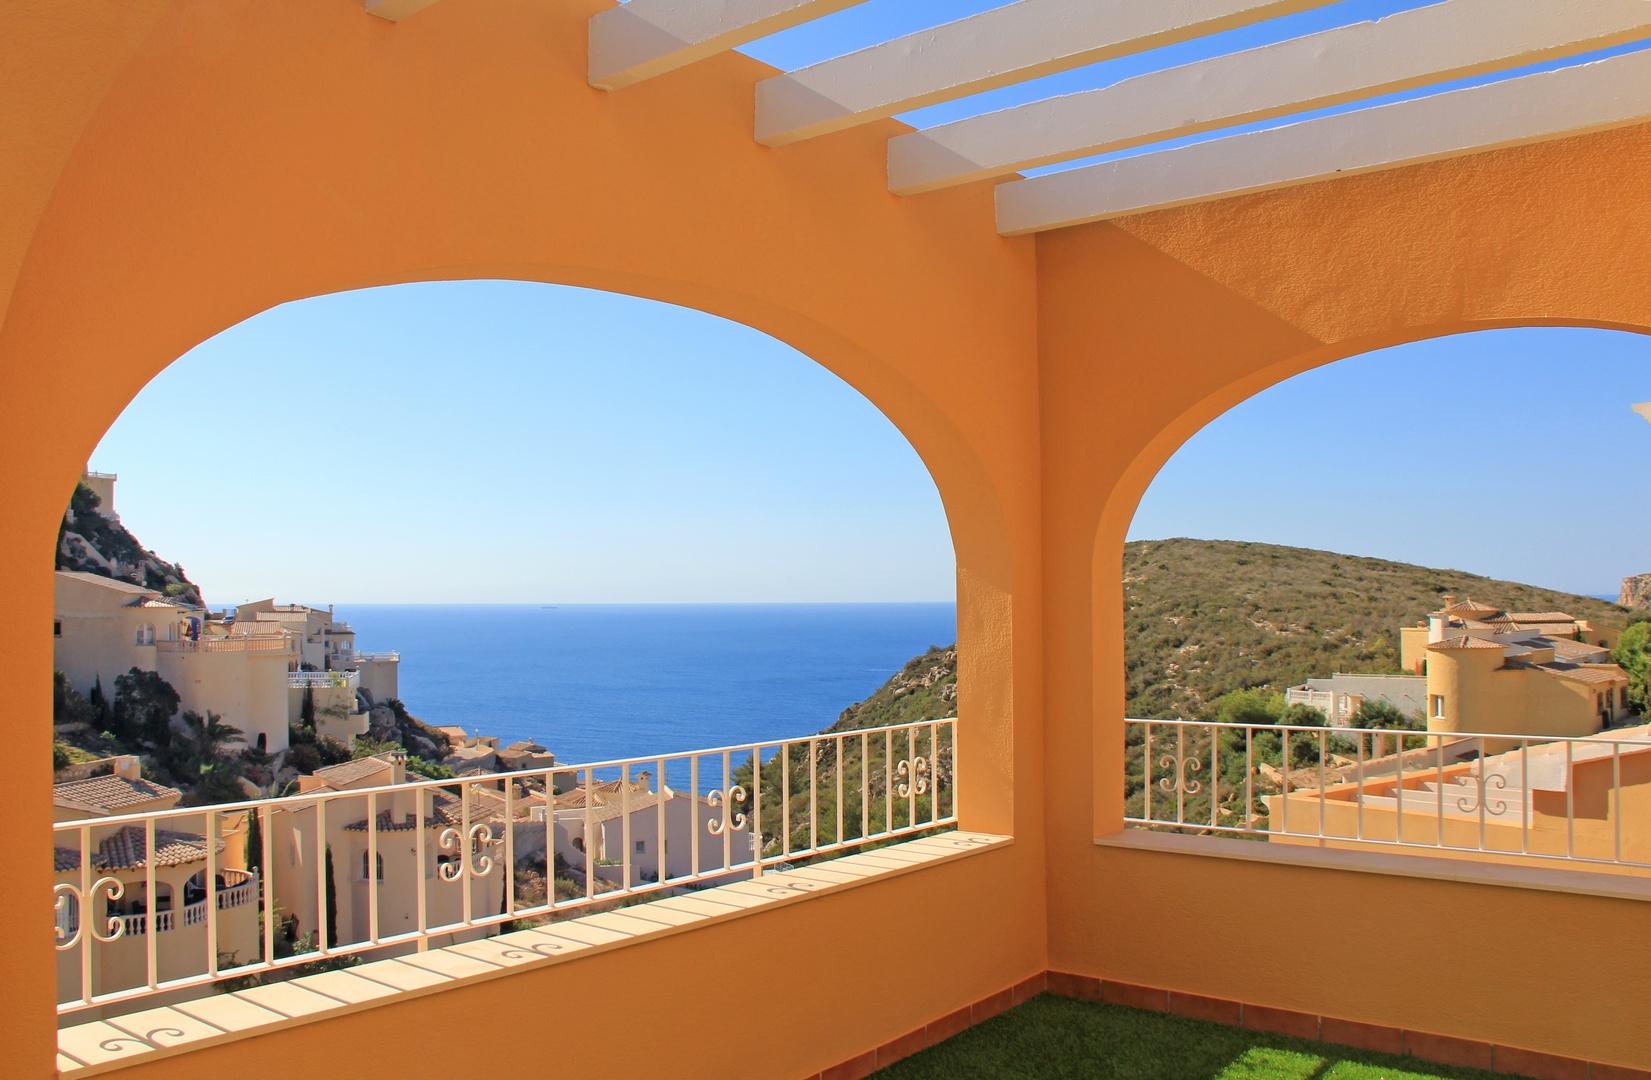 Apartamentos Miramar de Montecala Cumbre del Sol en Benitachell  Comprar y vender casa en Calp Benidorm Altea Moraira AlicanteLeukante